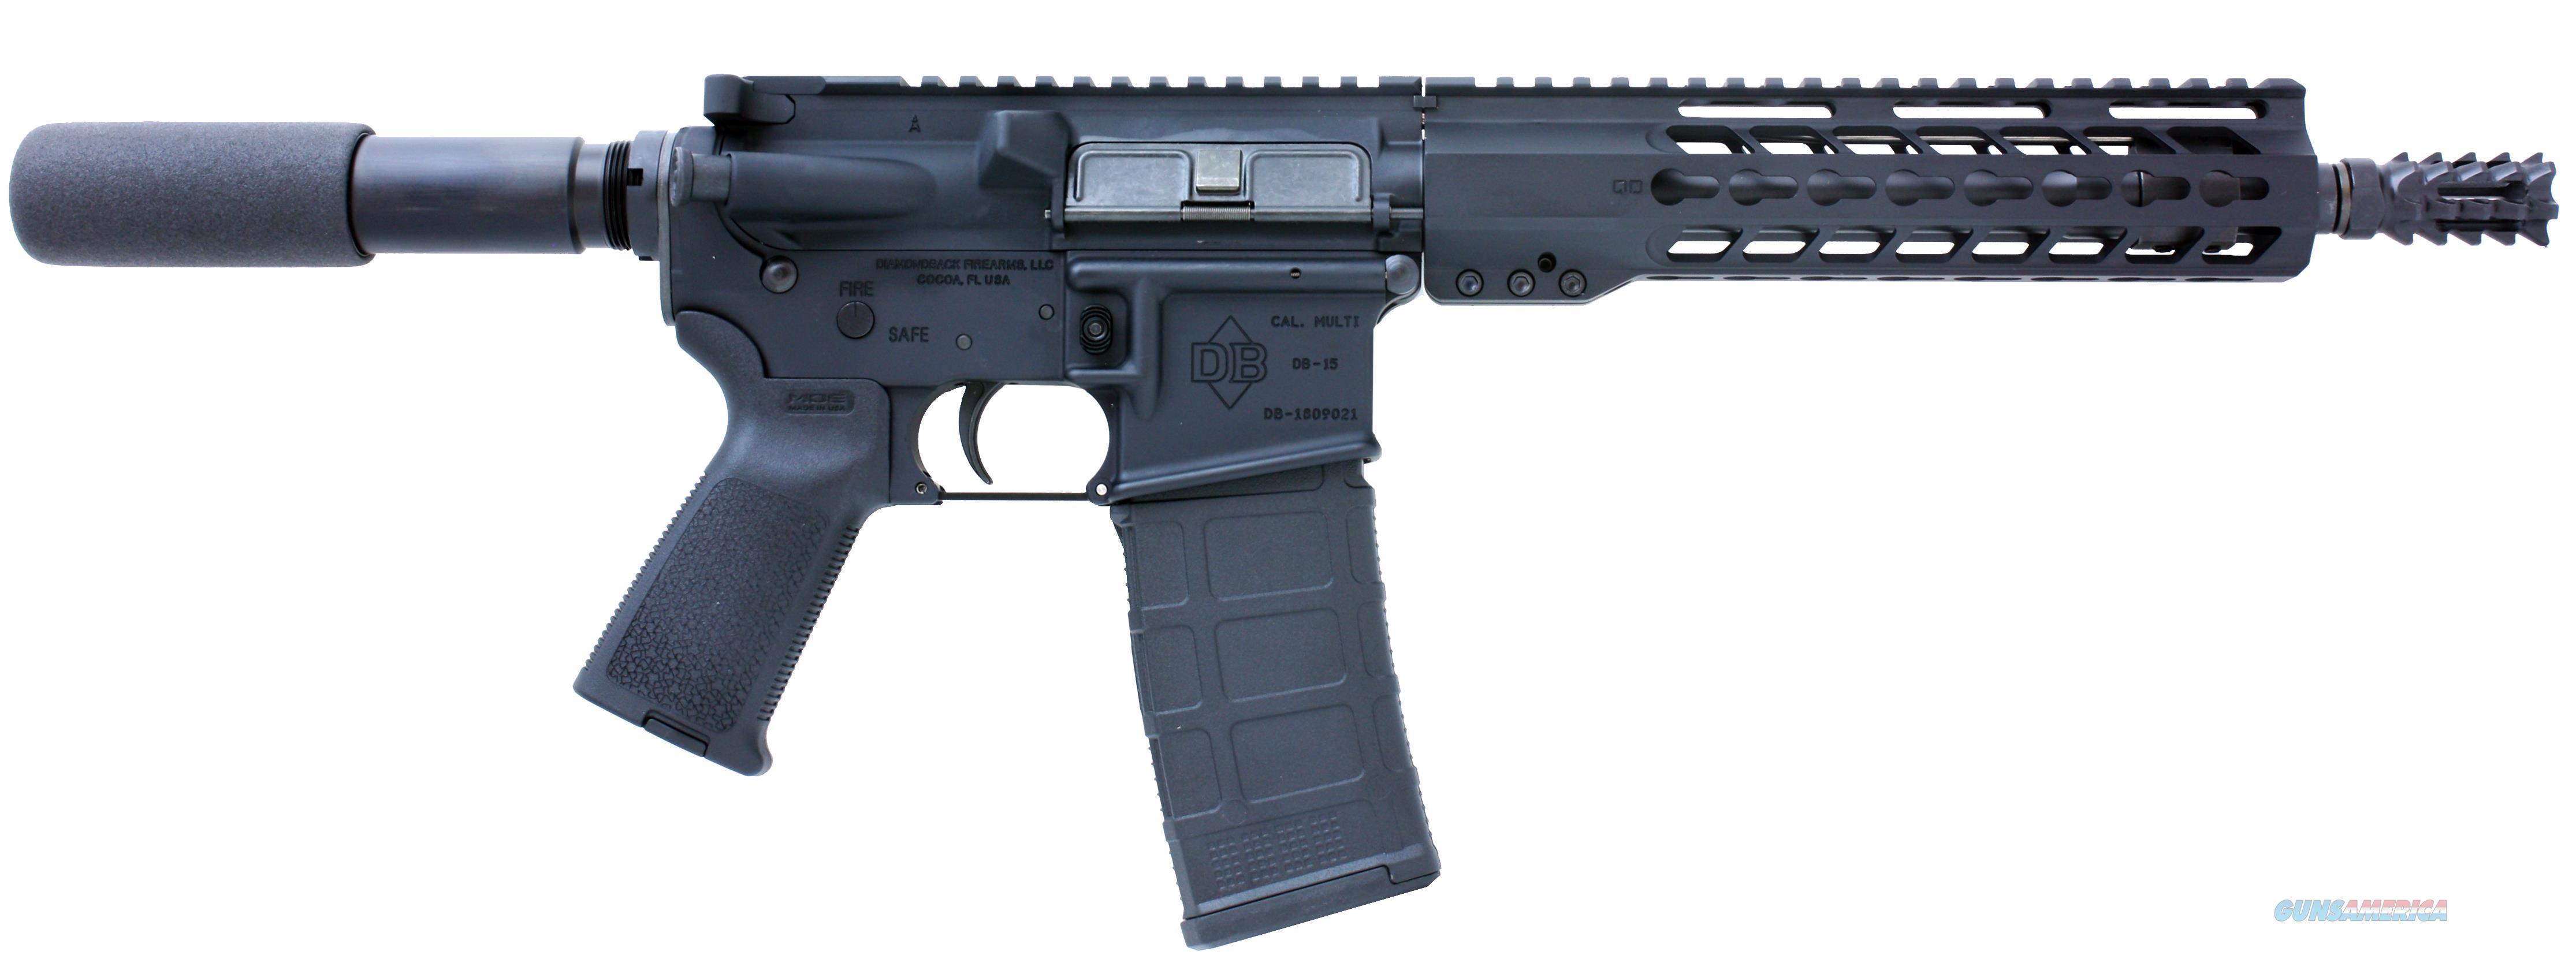 "Diamondback Db15pb10 Db15 Ar Pistol Pistol Length Semi-Automatic 223 Remington/5.56 Nato 10.5"" 30+1  Black Hard Coat Anodized DB15PB10  Guns > Pistols > D Misc Pistols"